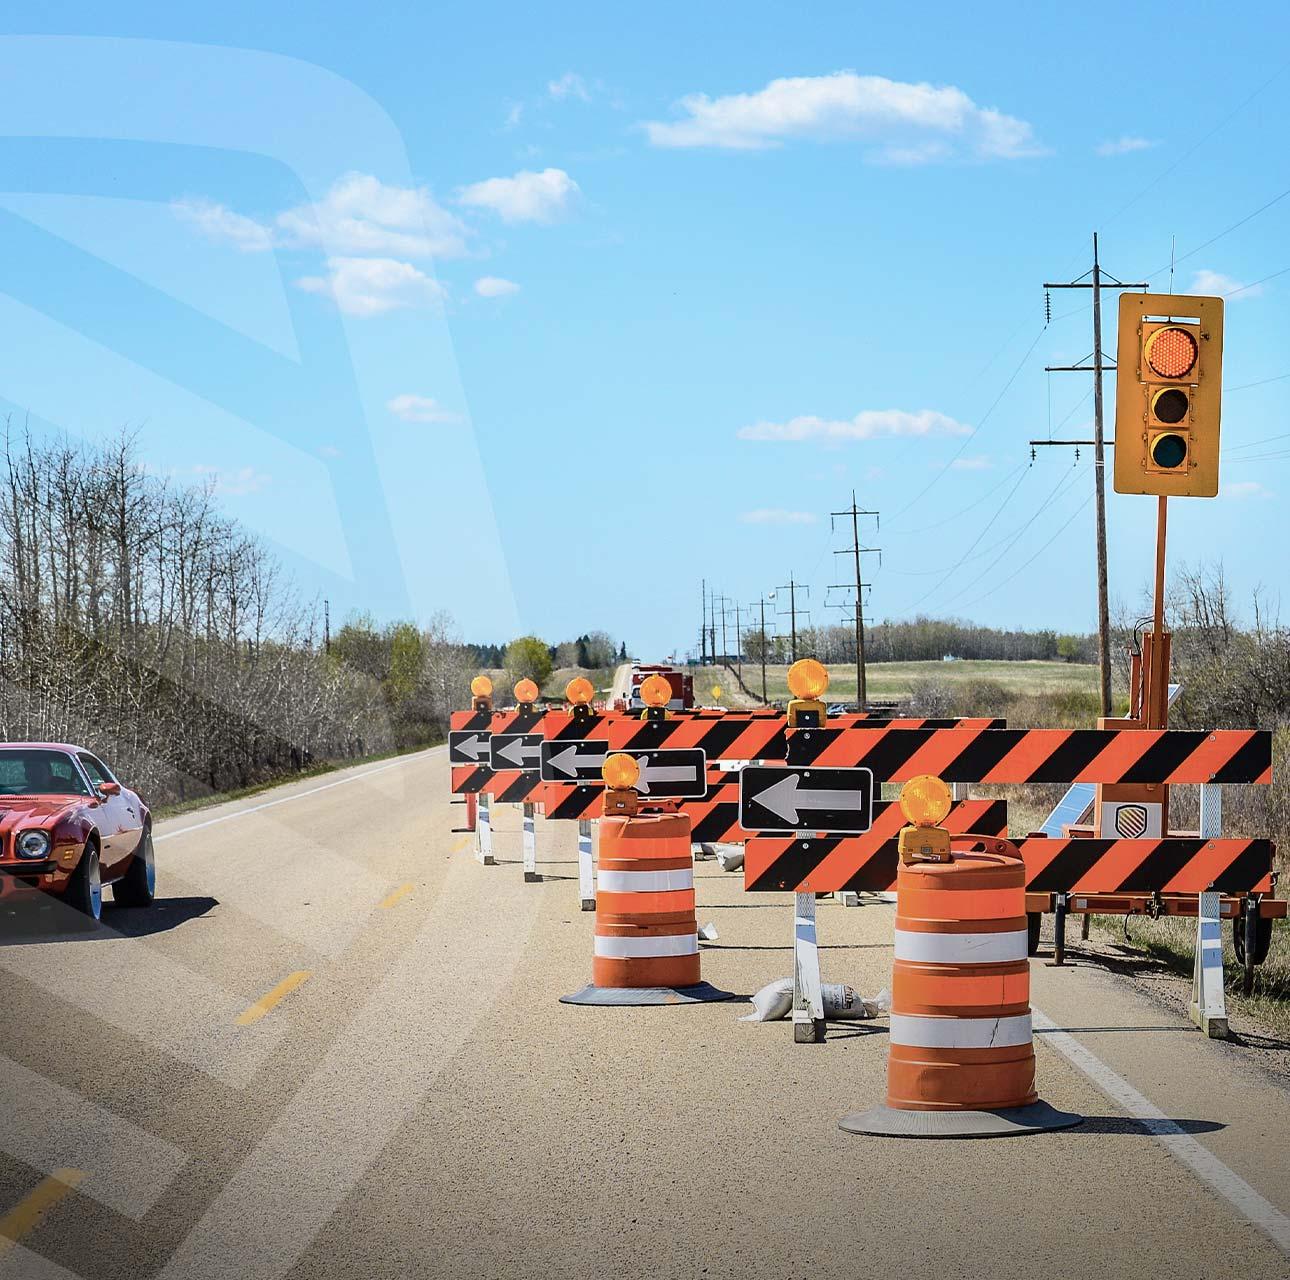 Barricades-barricades-and-signs-0001